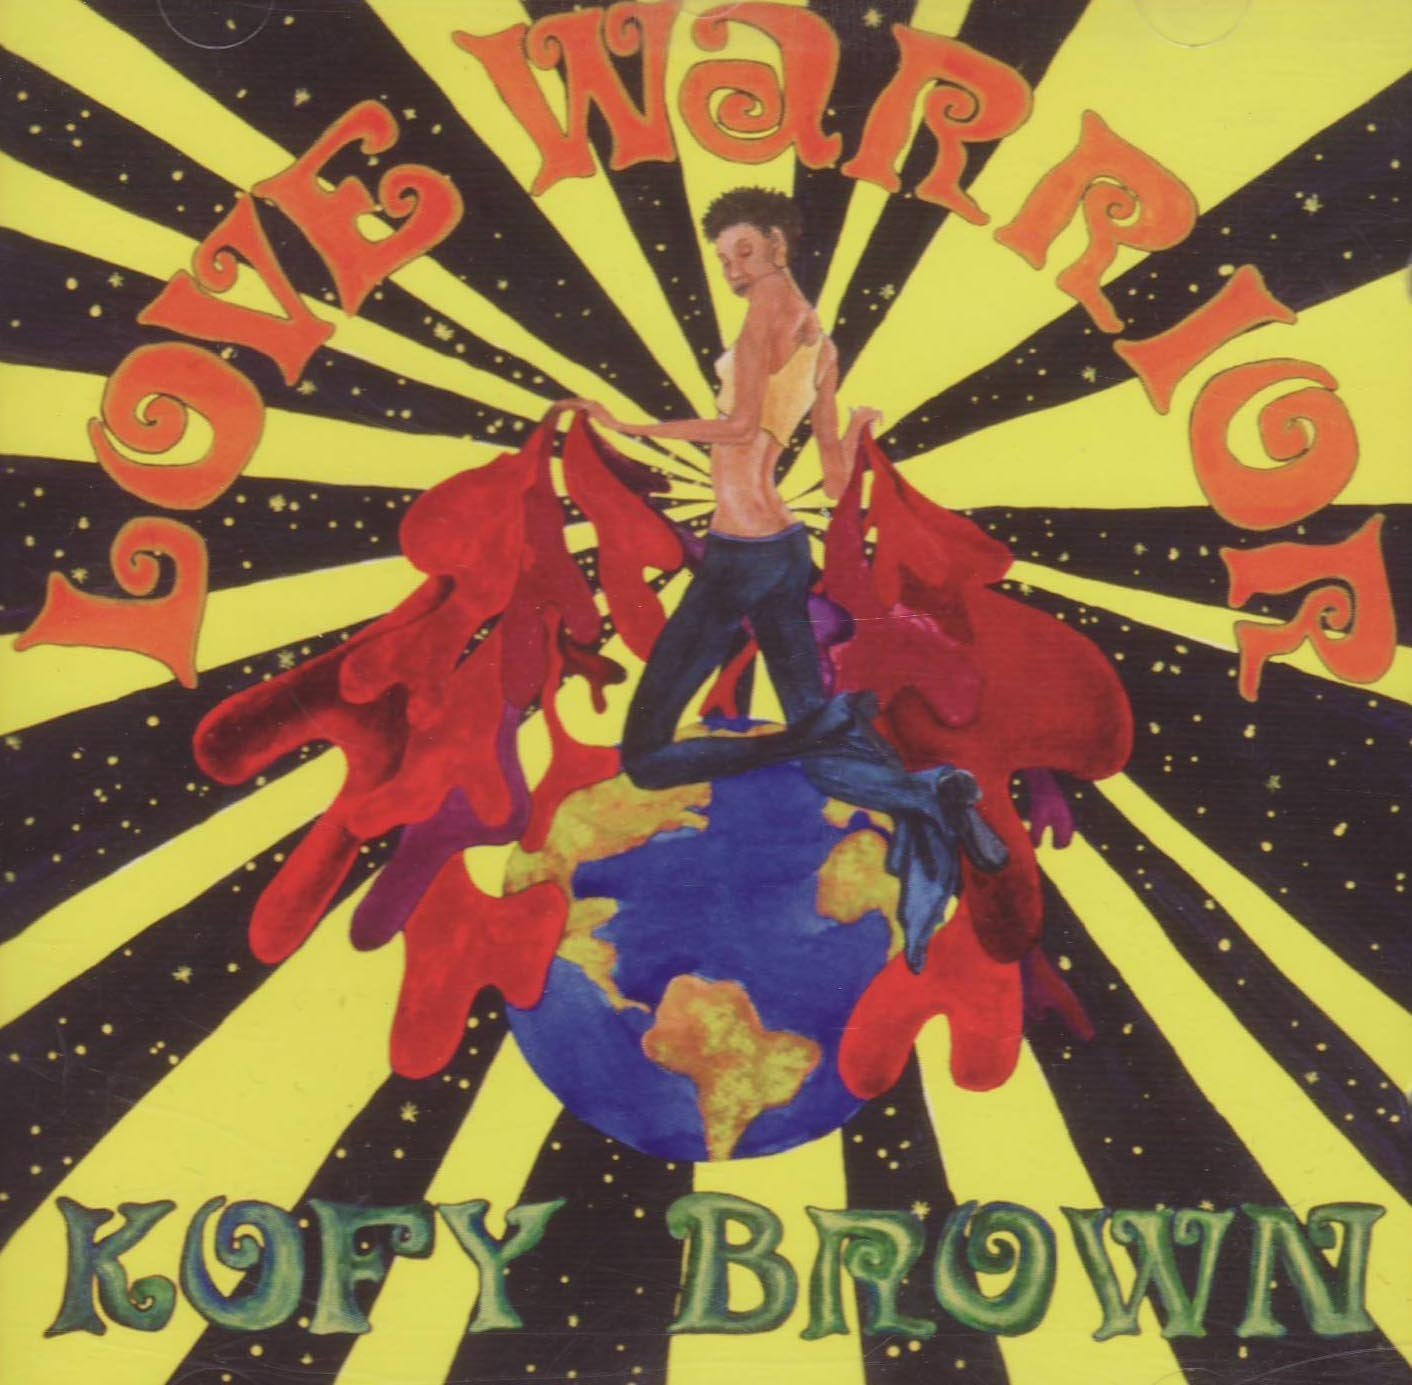 Kofy Brown – Love Warrior CD (Soul Brother)